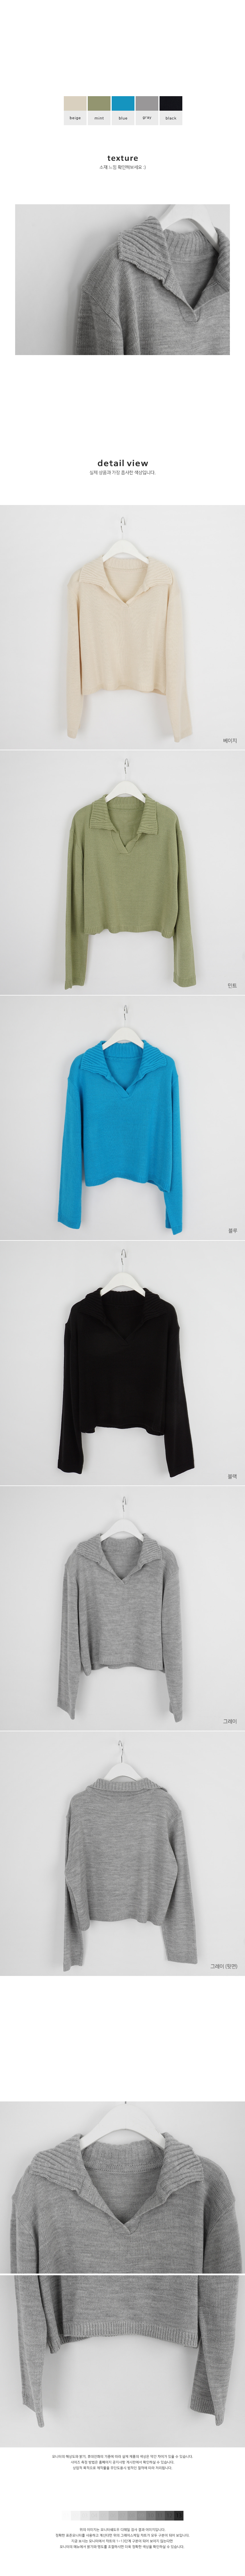 Semi-open collar knit